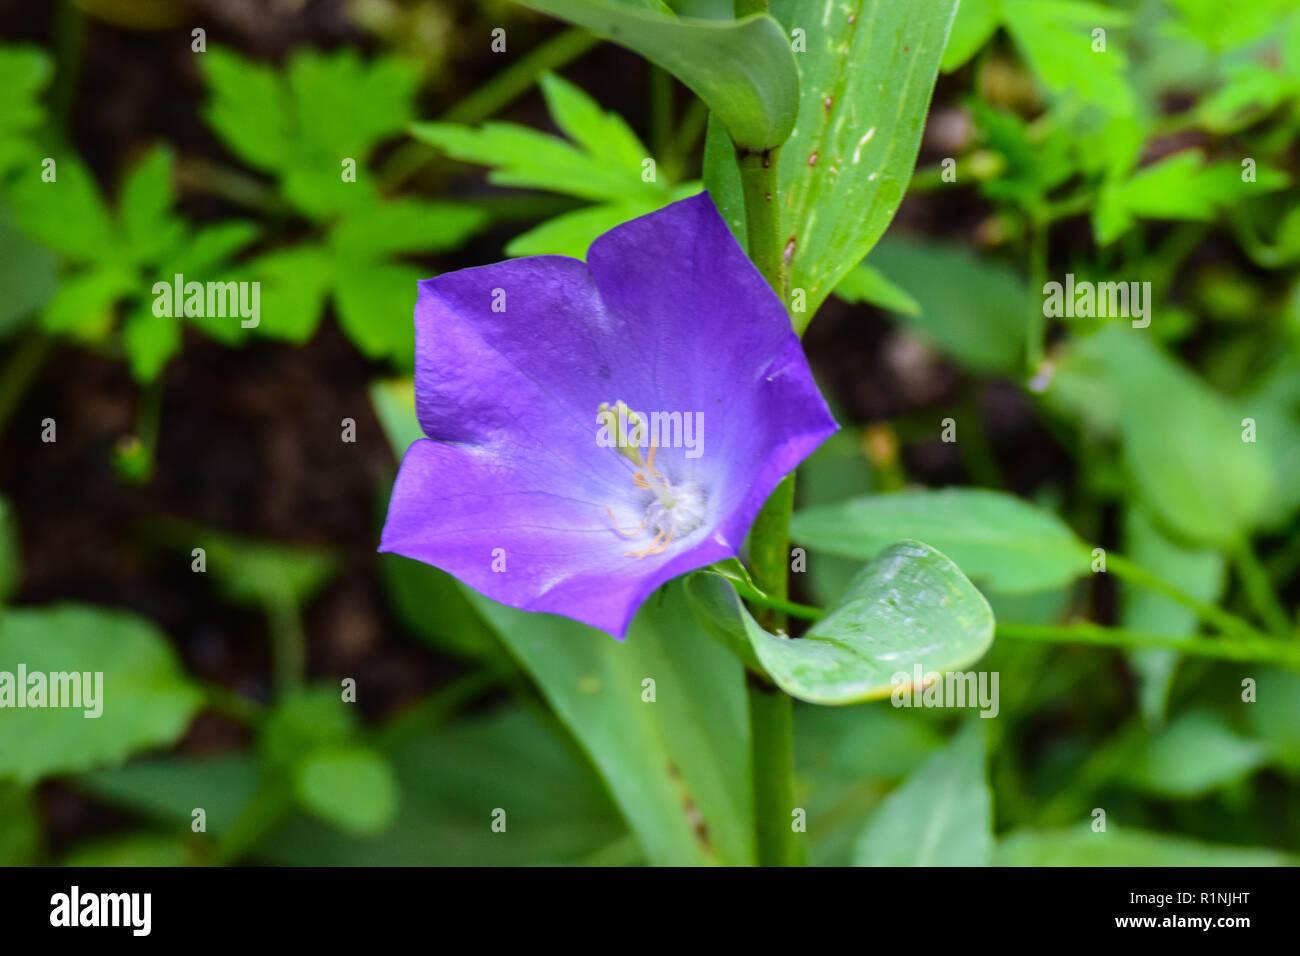 Gardens - Stock Image